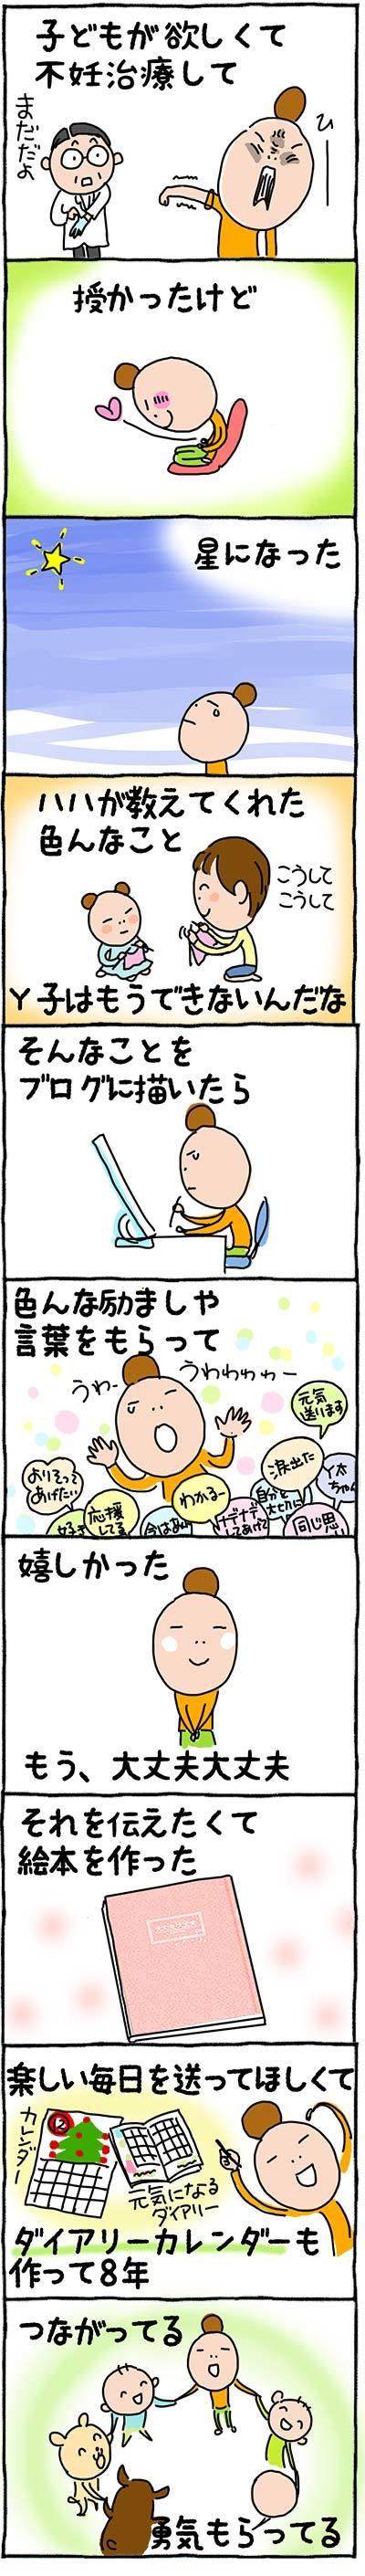 170707自己紹介04